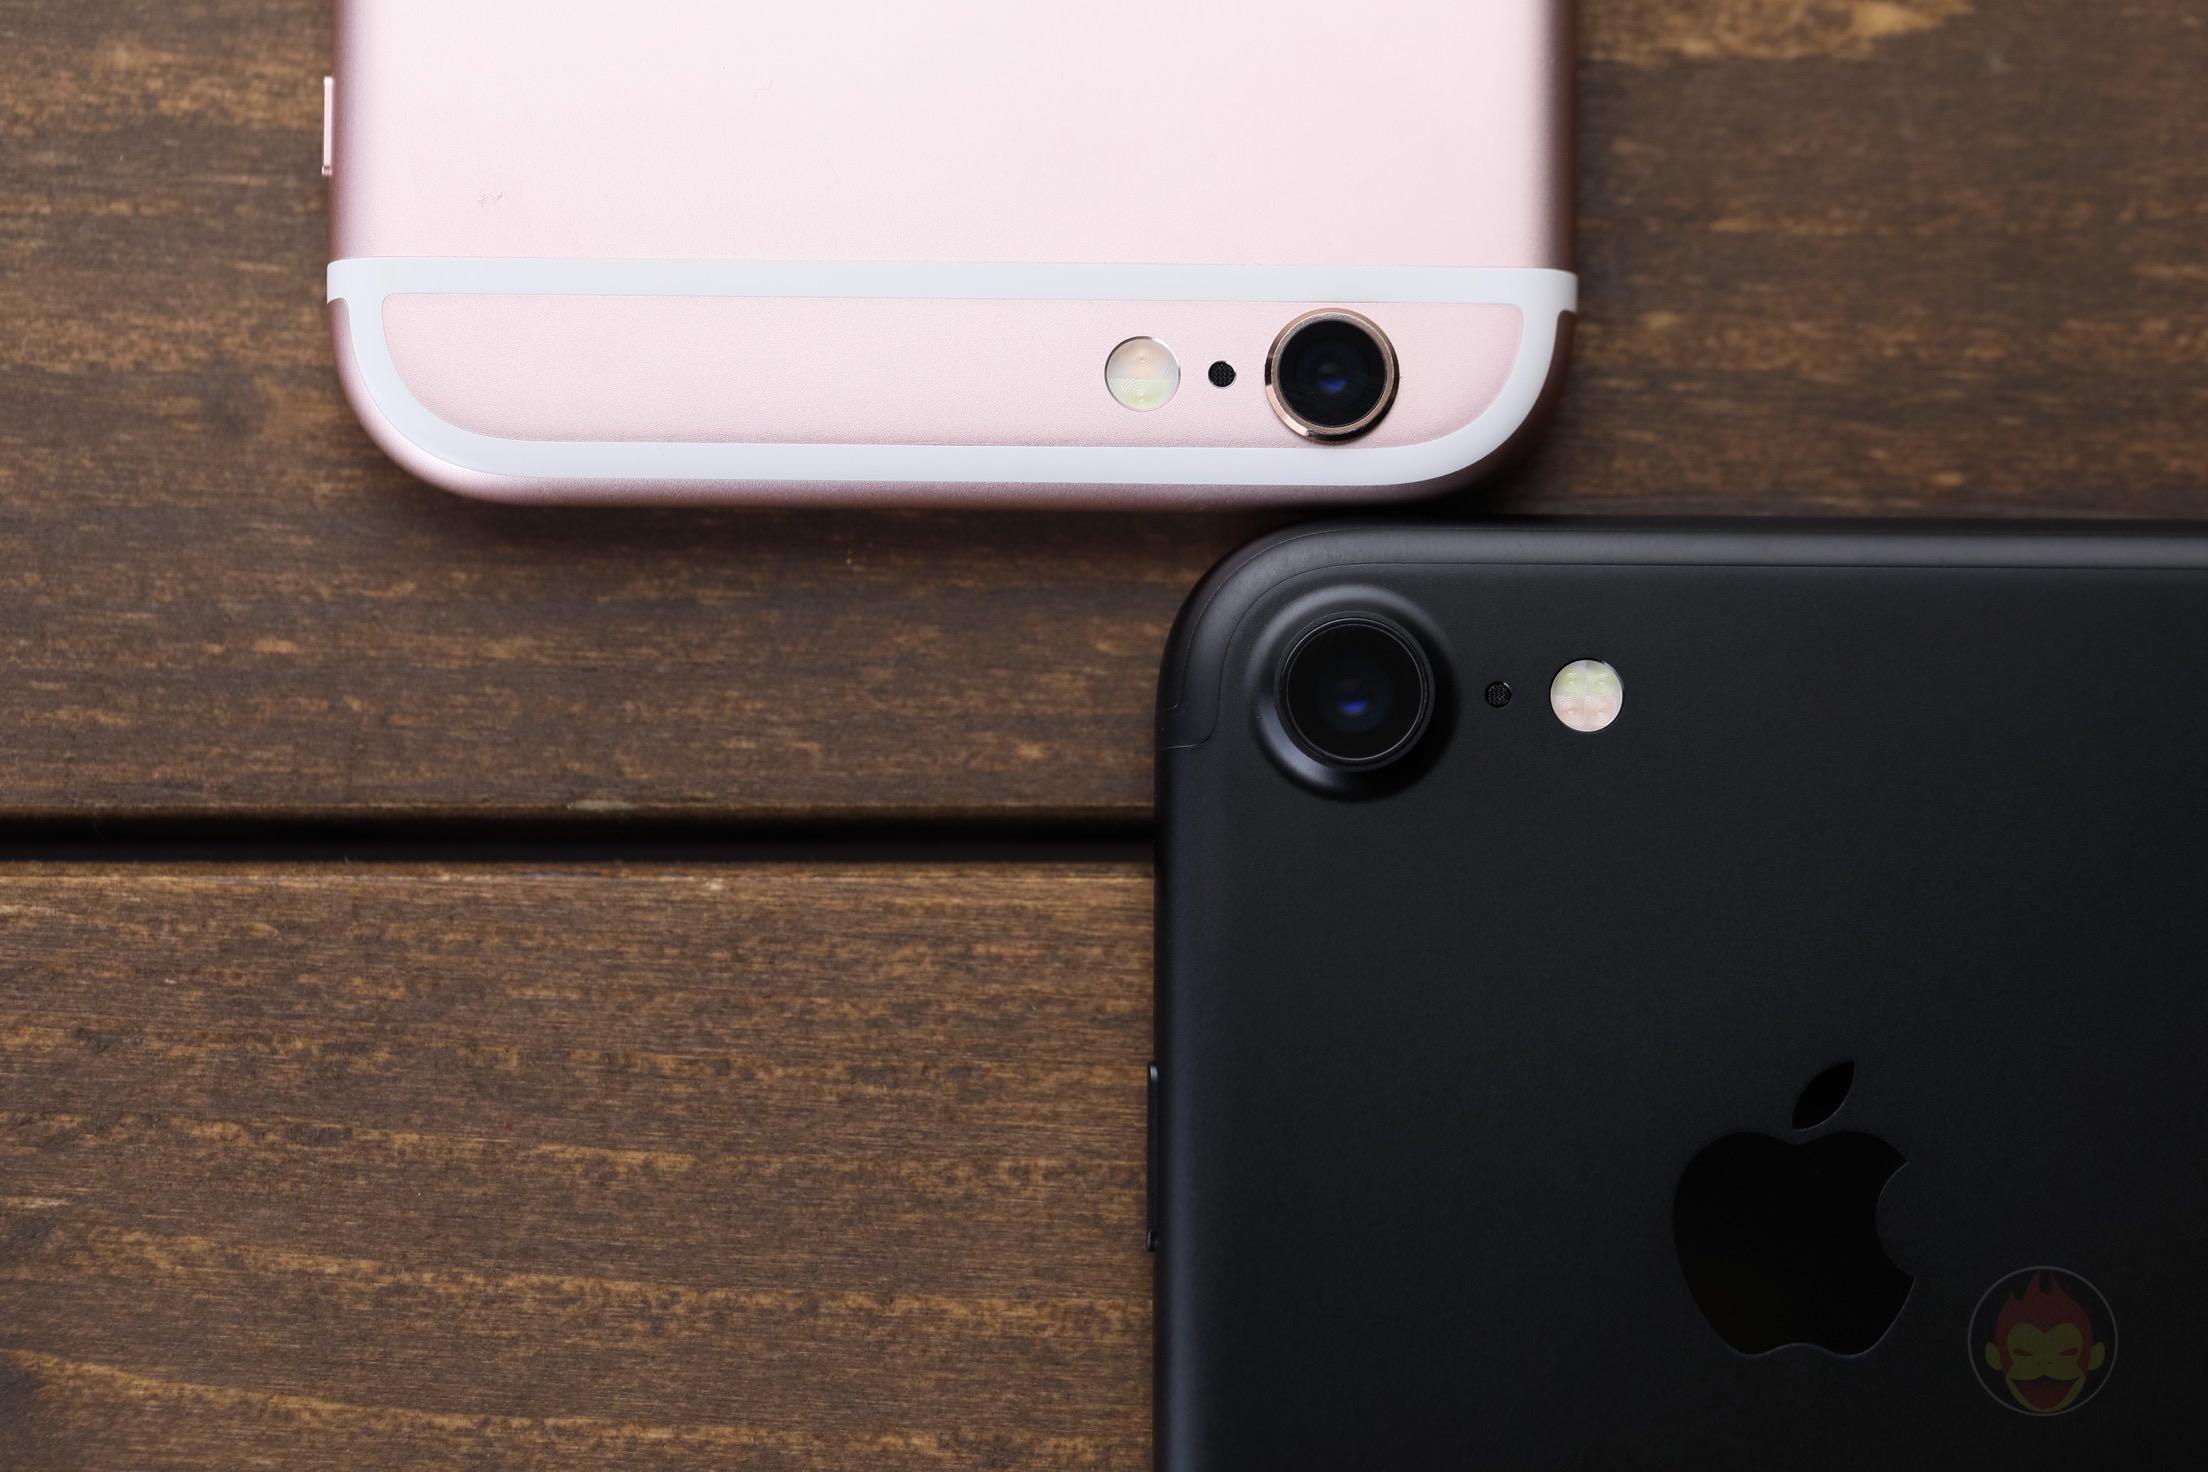 iPhone7-iPhone6s-Comparison-07.jpg